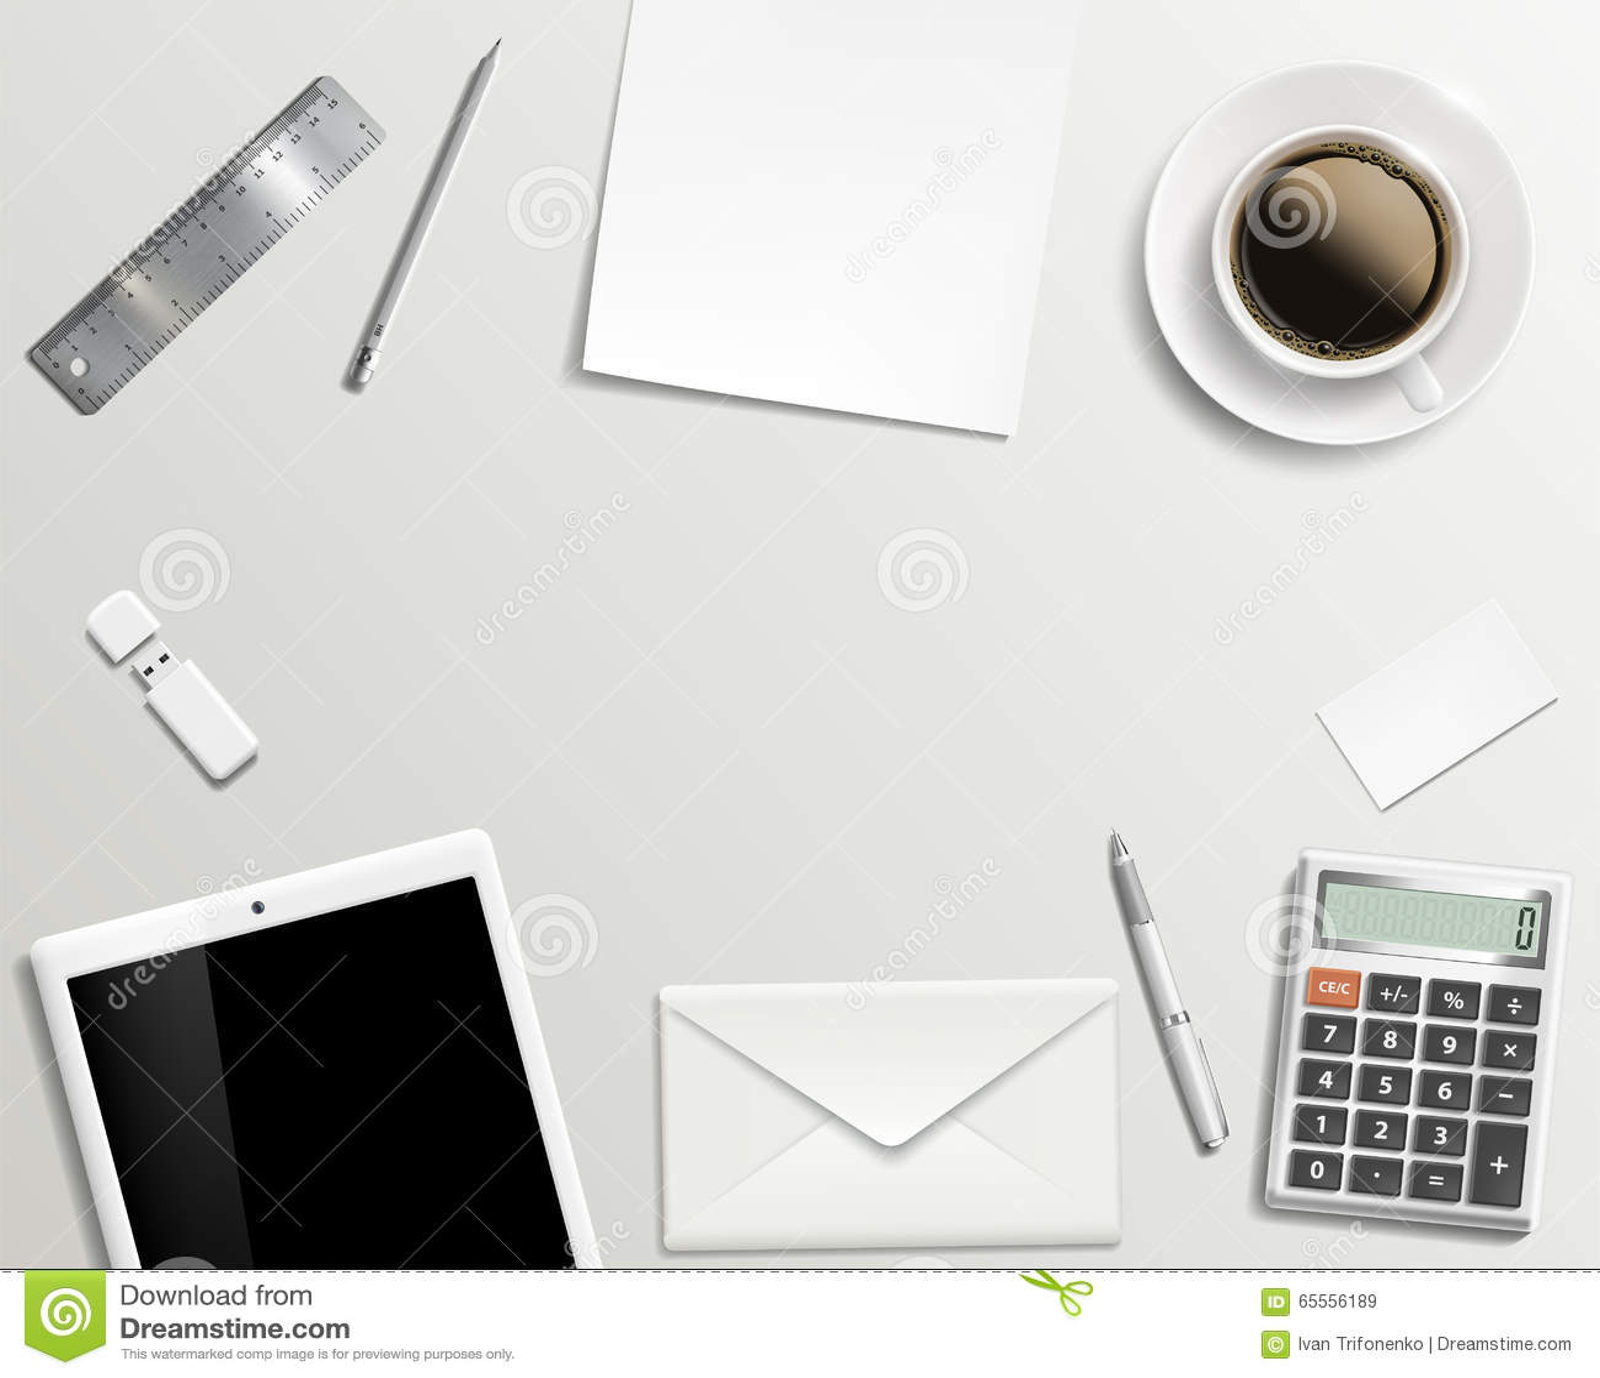 Office Desk Wallpaper: Blank Office Desk Background. Stock Photo